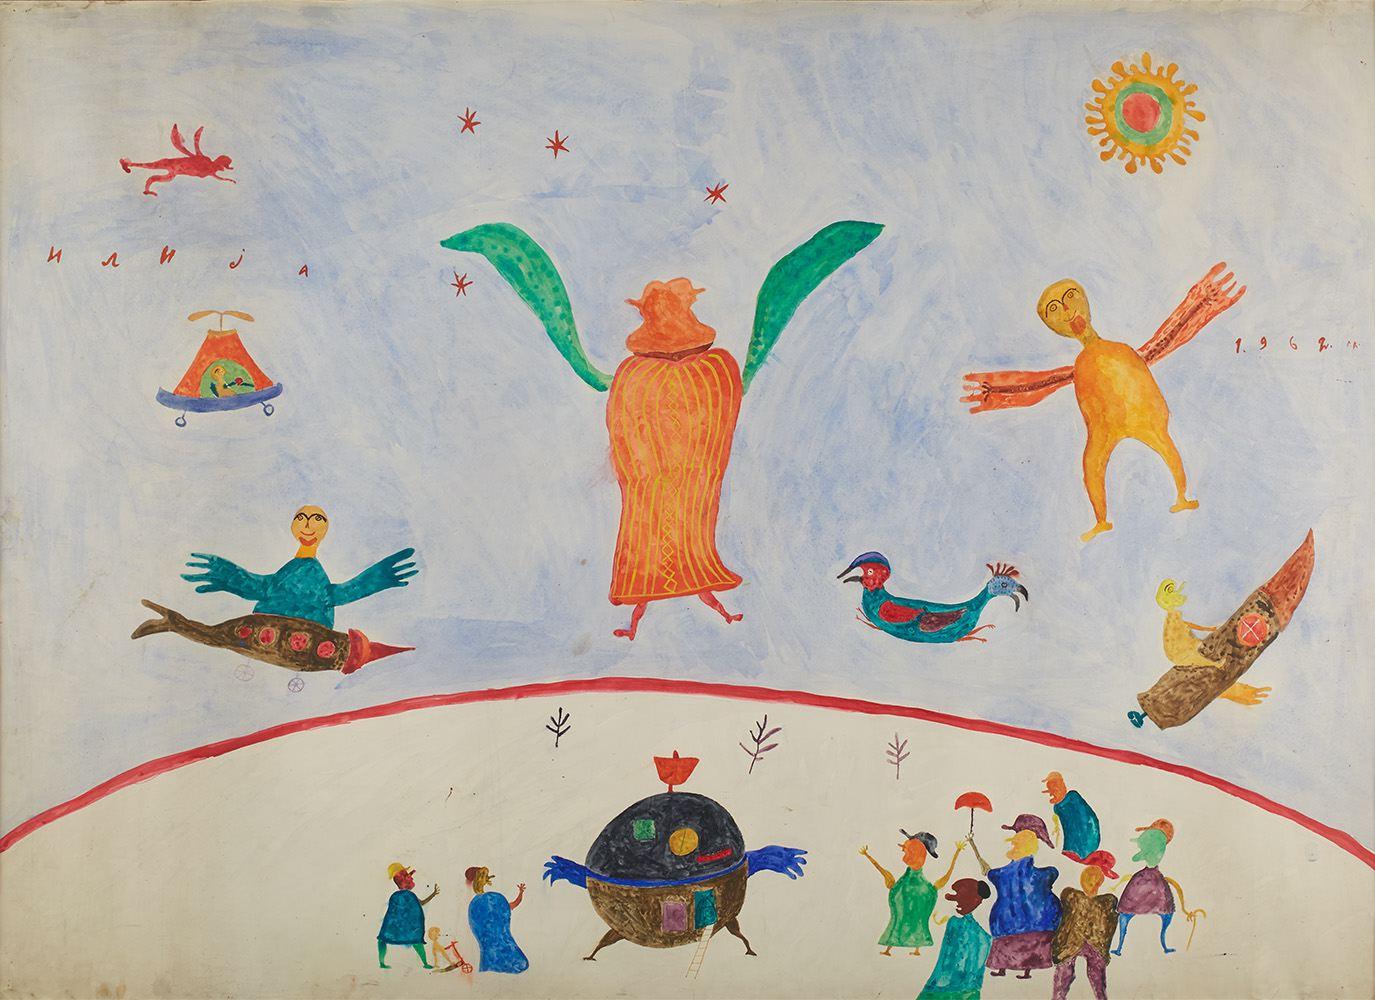 Ilija Bosilj Bašičević,   Interplanetary Travelers  , 1962, Gouache on paper, 42.125 x 59.125 inches, 107 x 150.2 cm, IBo 13